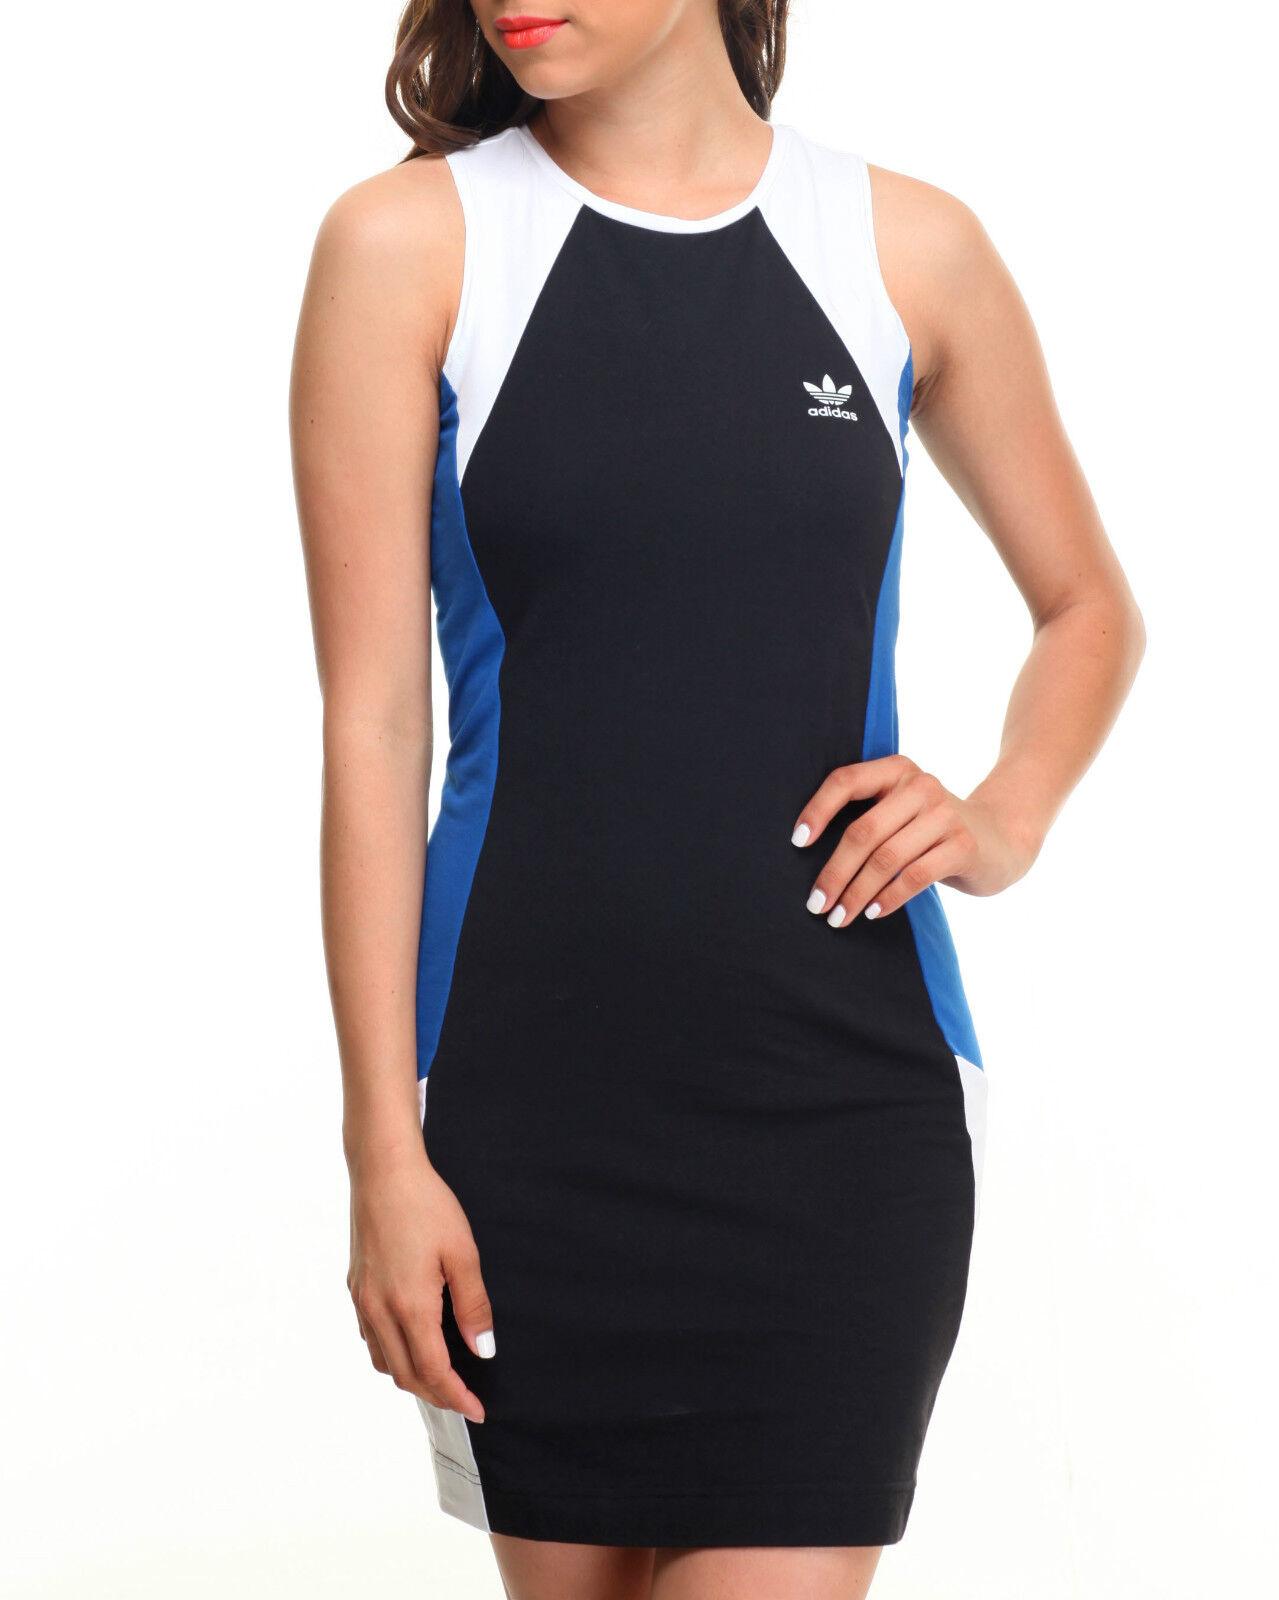 b1c062d5ee Adidas Originals W Running Tight Tight Tight Vestito Aderente Misura NUOVO  (541) 7cc7ba